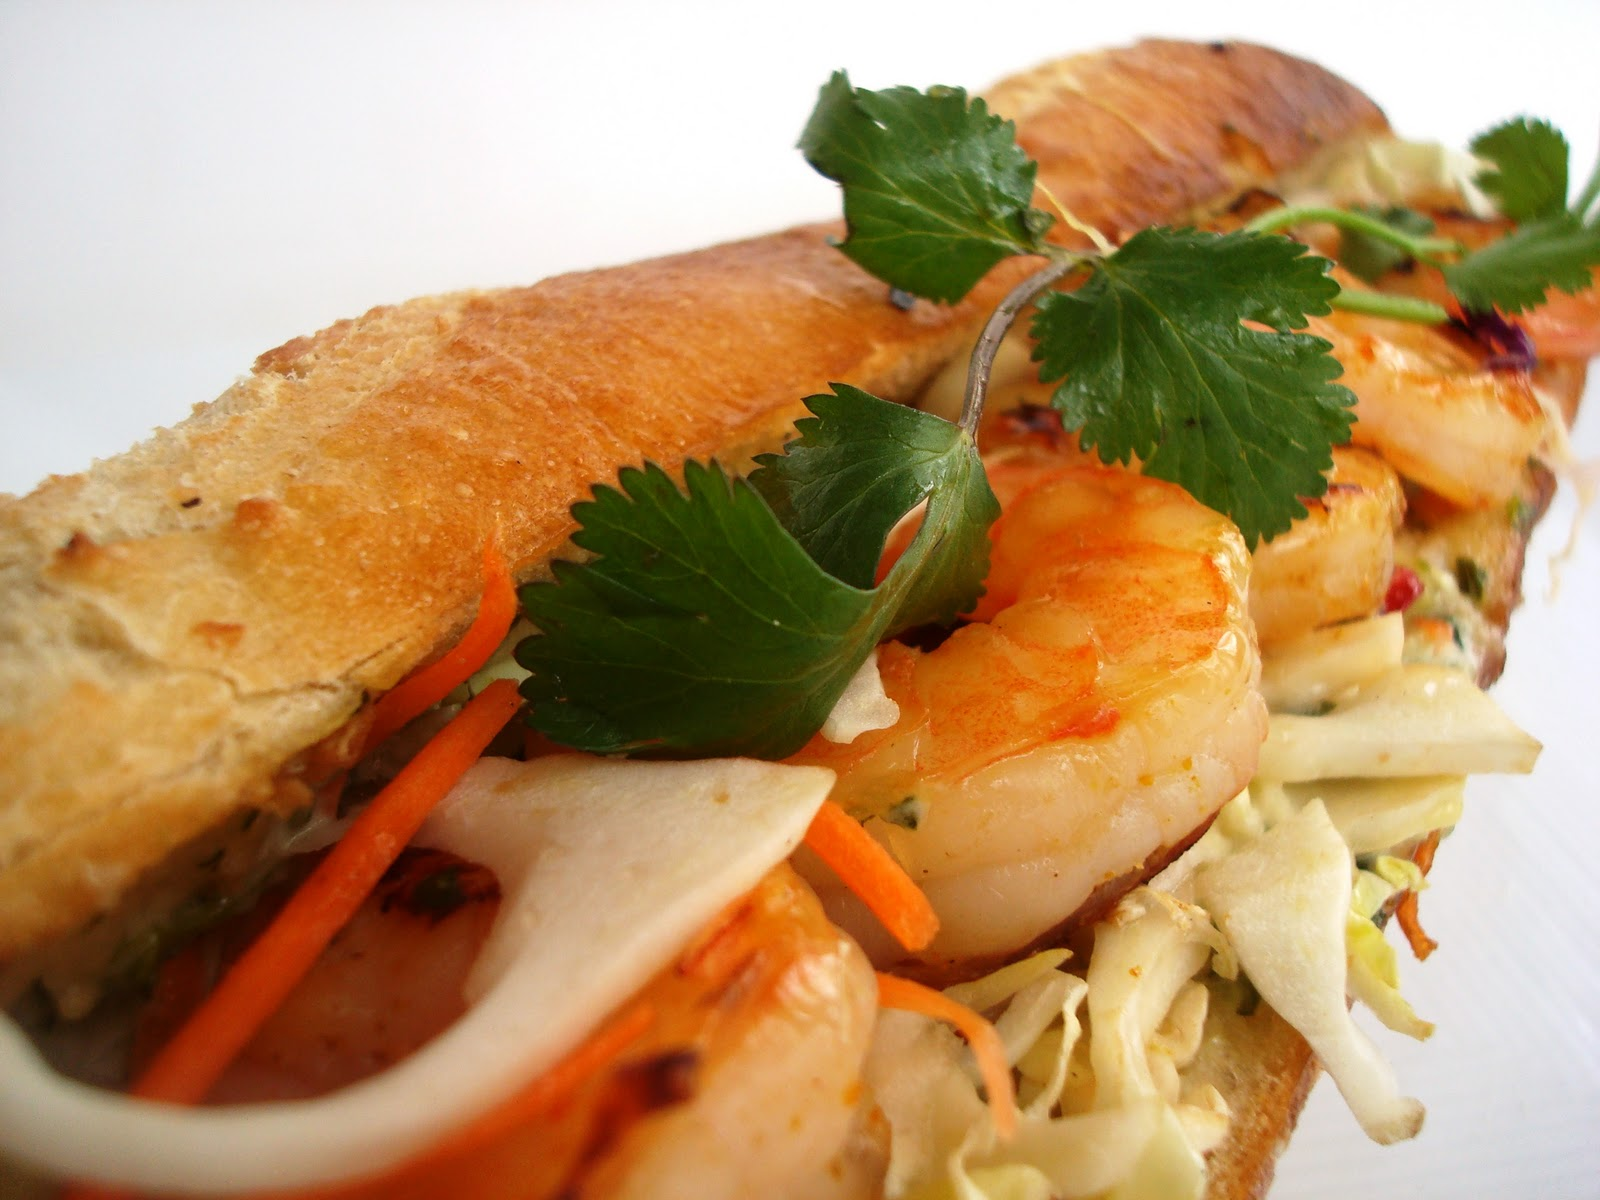 Grilled Shrimp with a Sweet Ginger Glaze